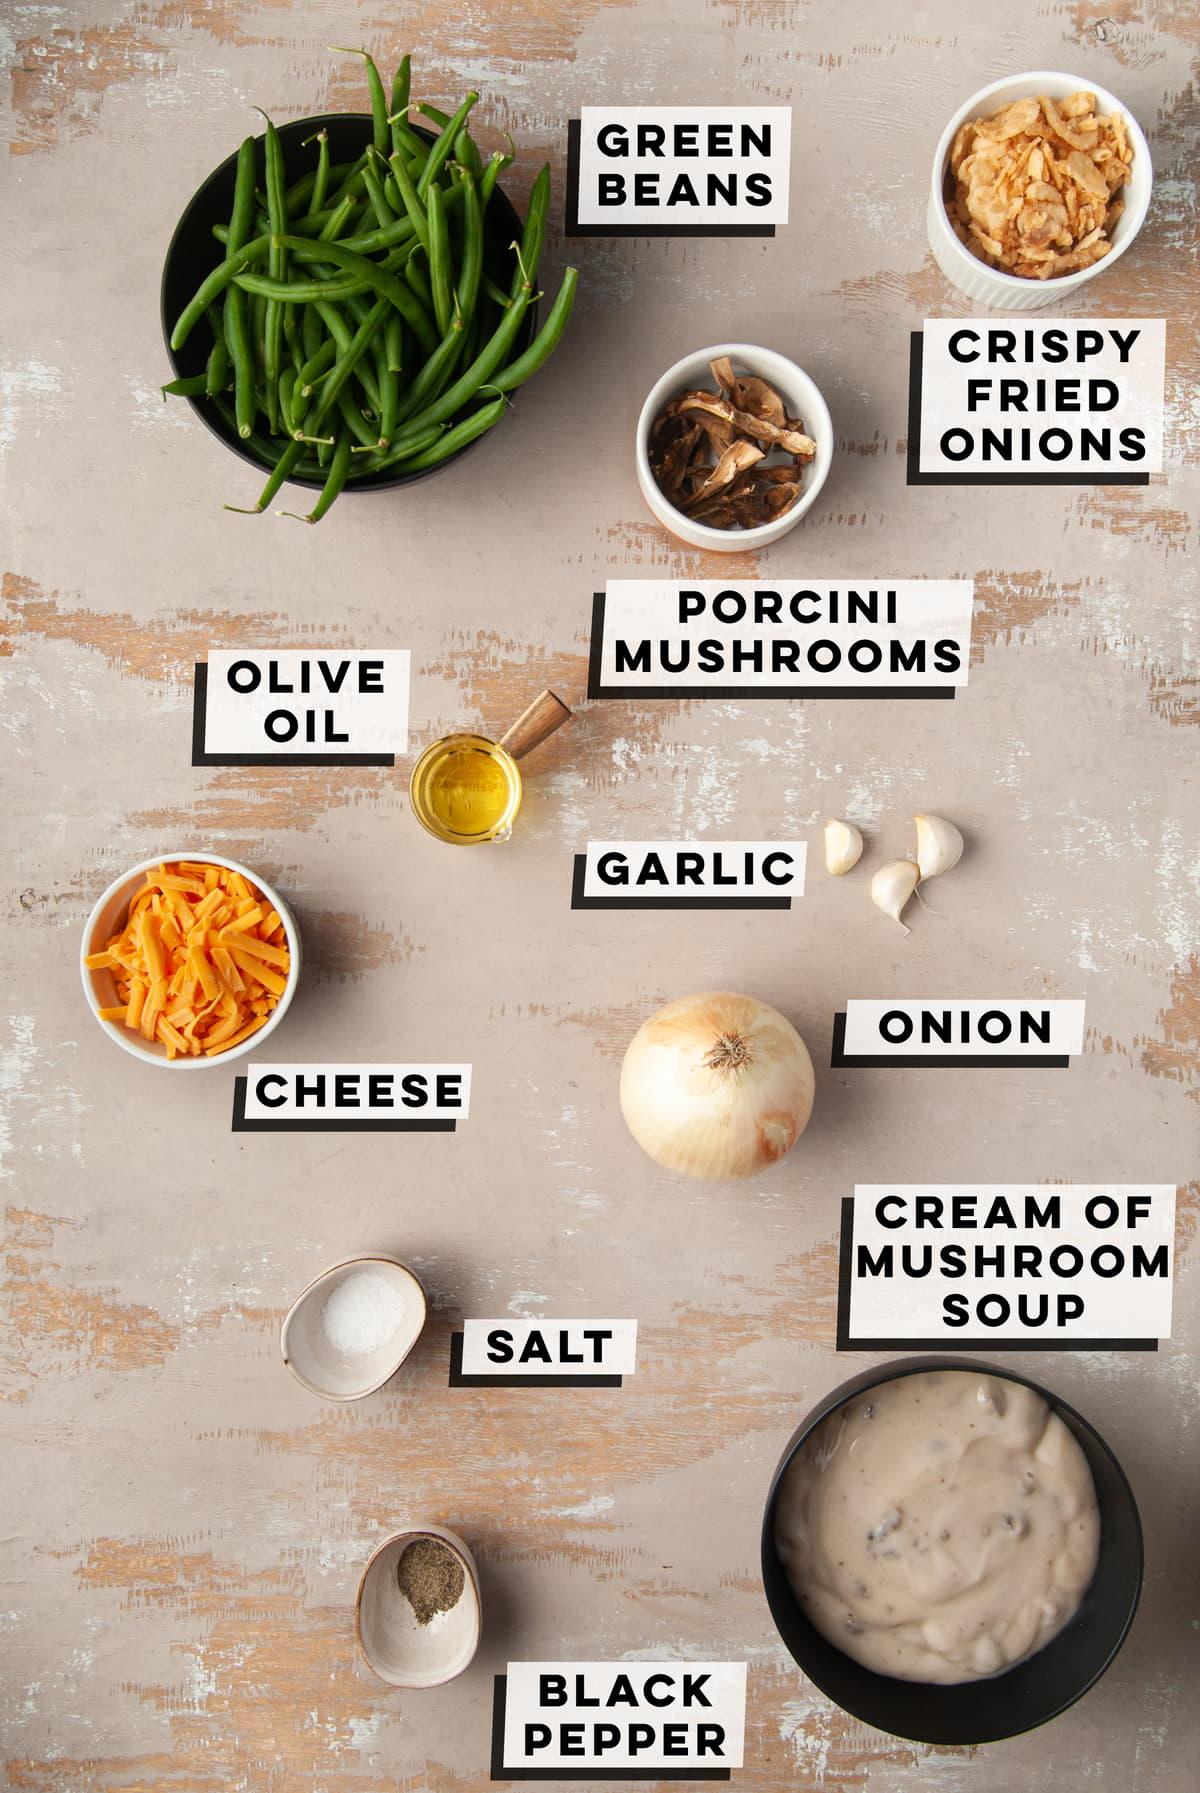 green beans, porcini mushrooms, cheddar cheese, olive oil, garlic, onion, salt, cream of mushroom soup, black pepper